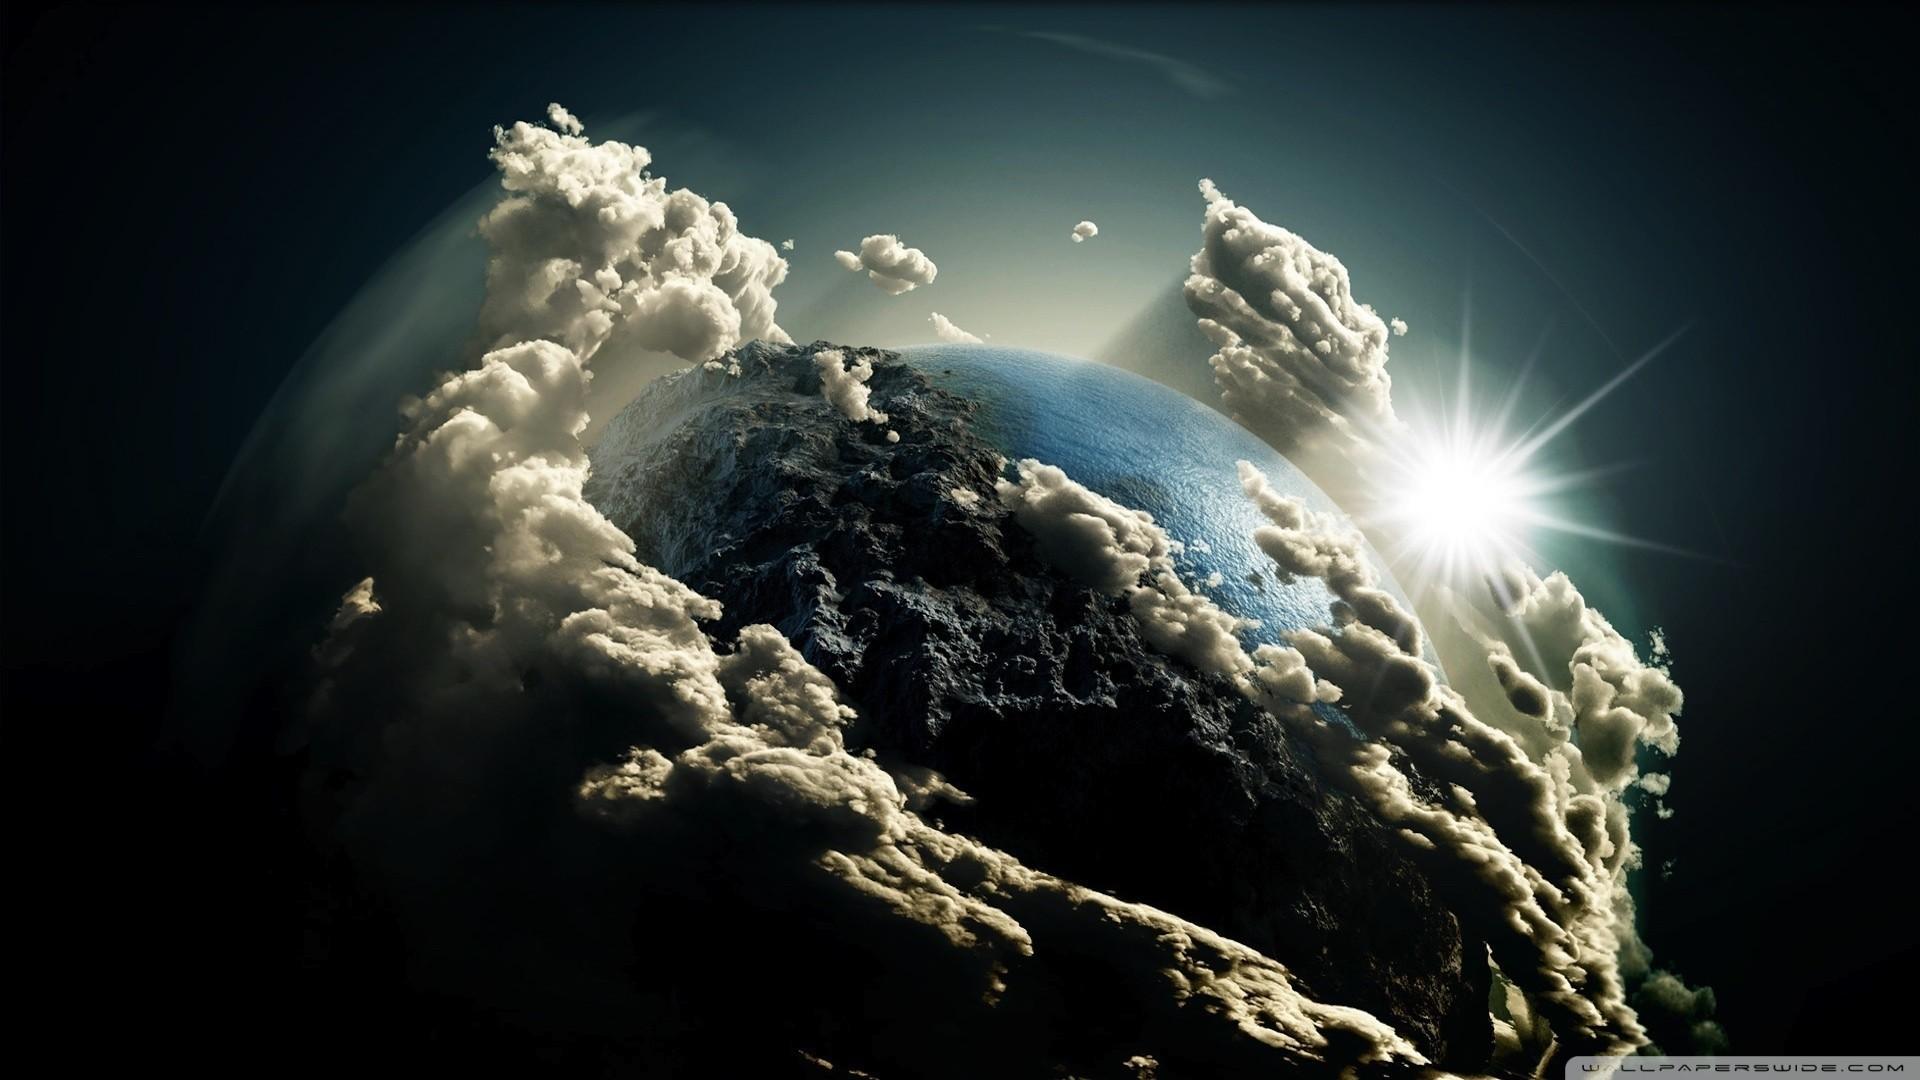 Earth Wallpaper Full HD [1920×1080]. #Followme #CooliPhone6Case on #Twitter  #